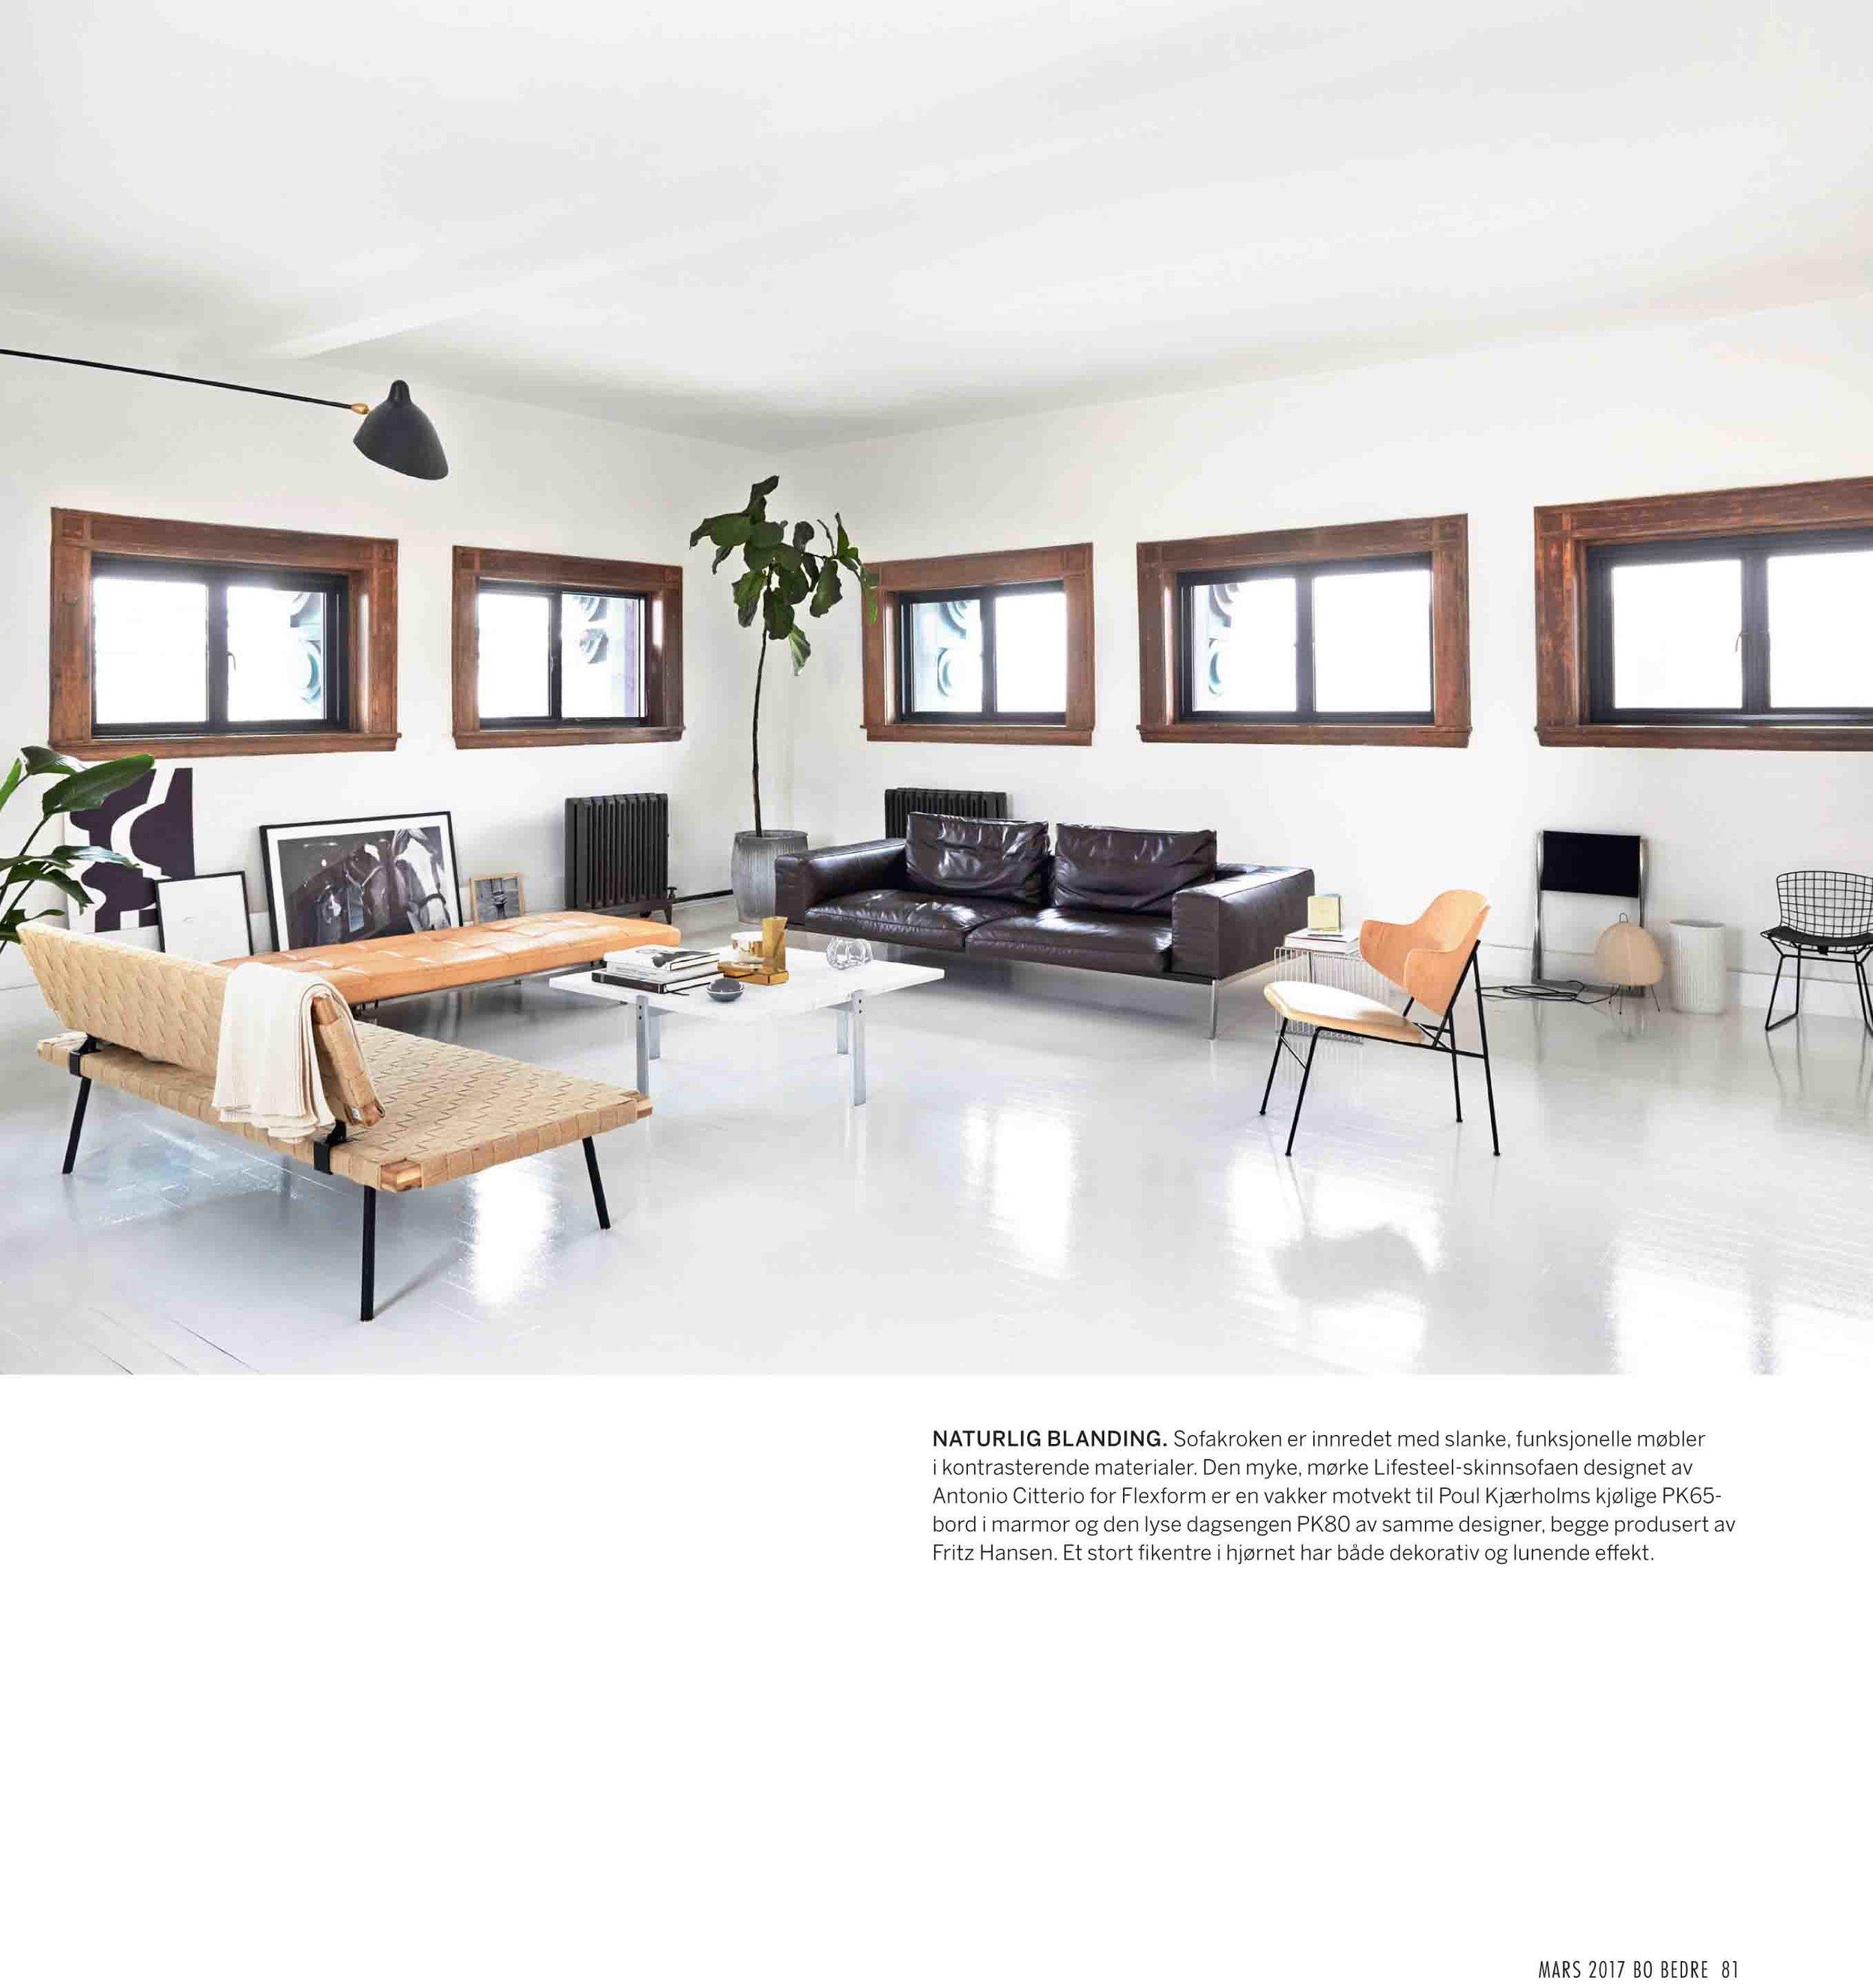 Camilla Vest Objects Press 6.jpg